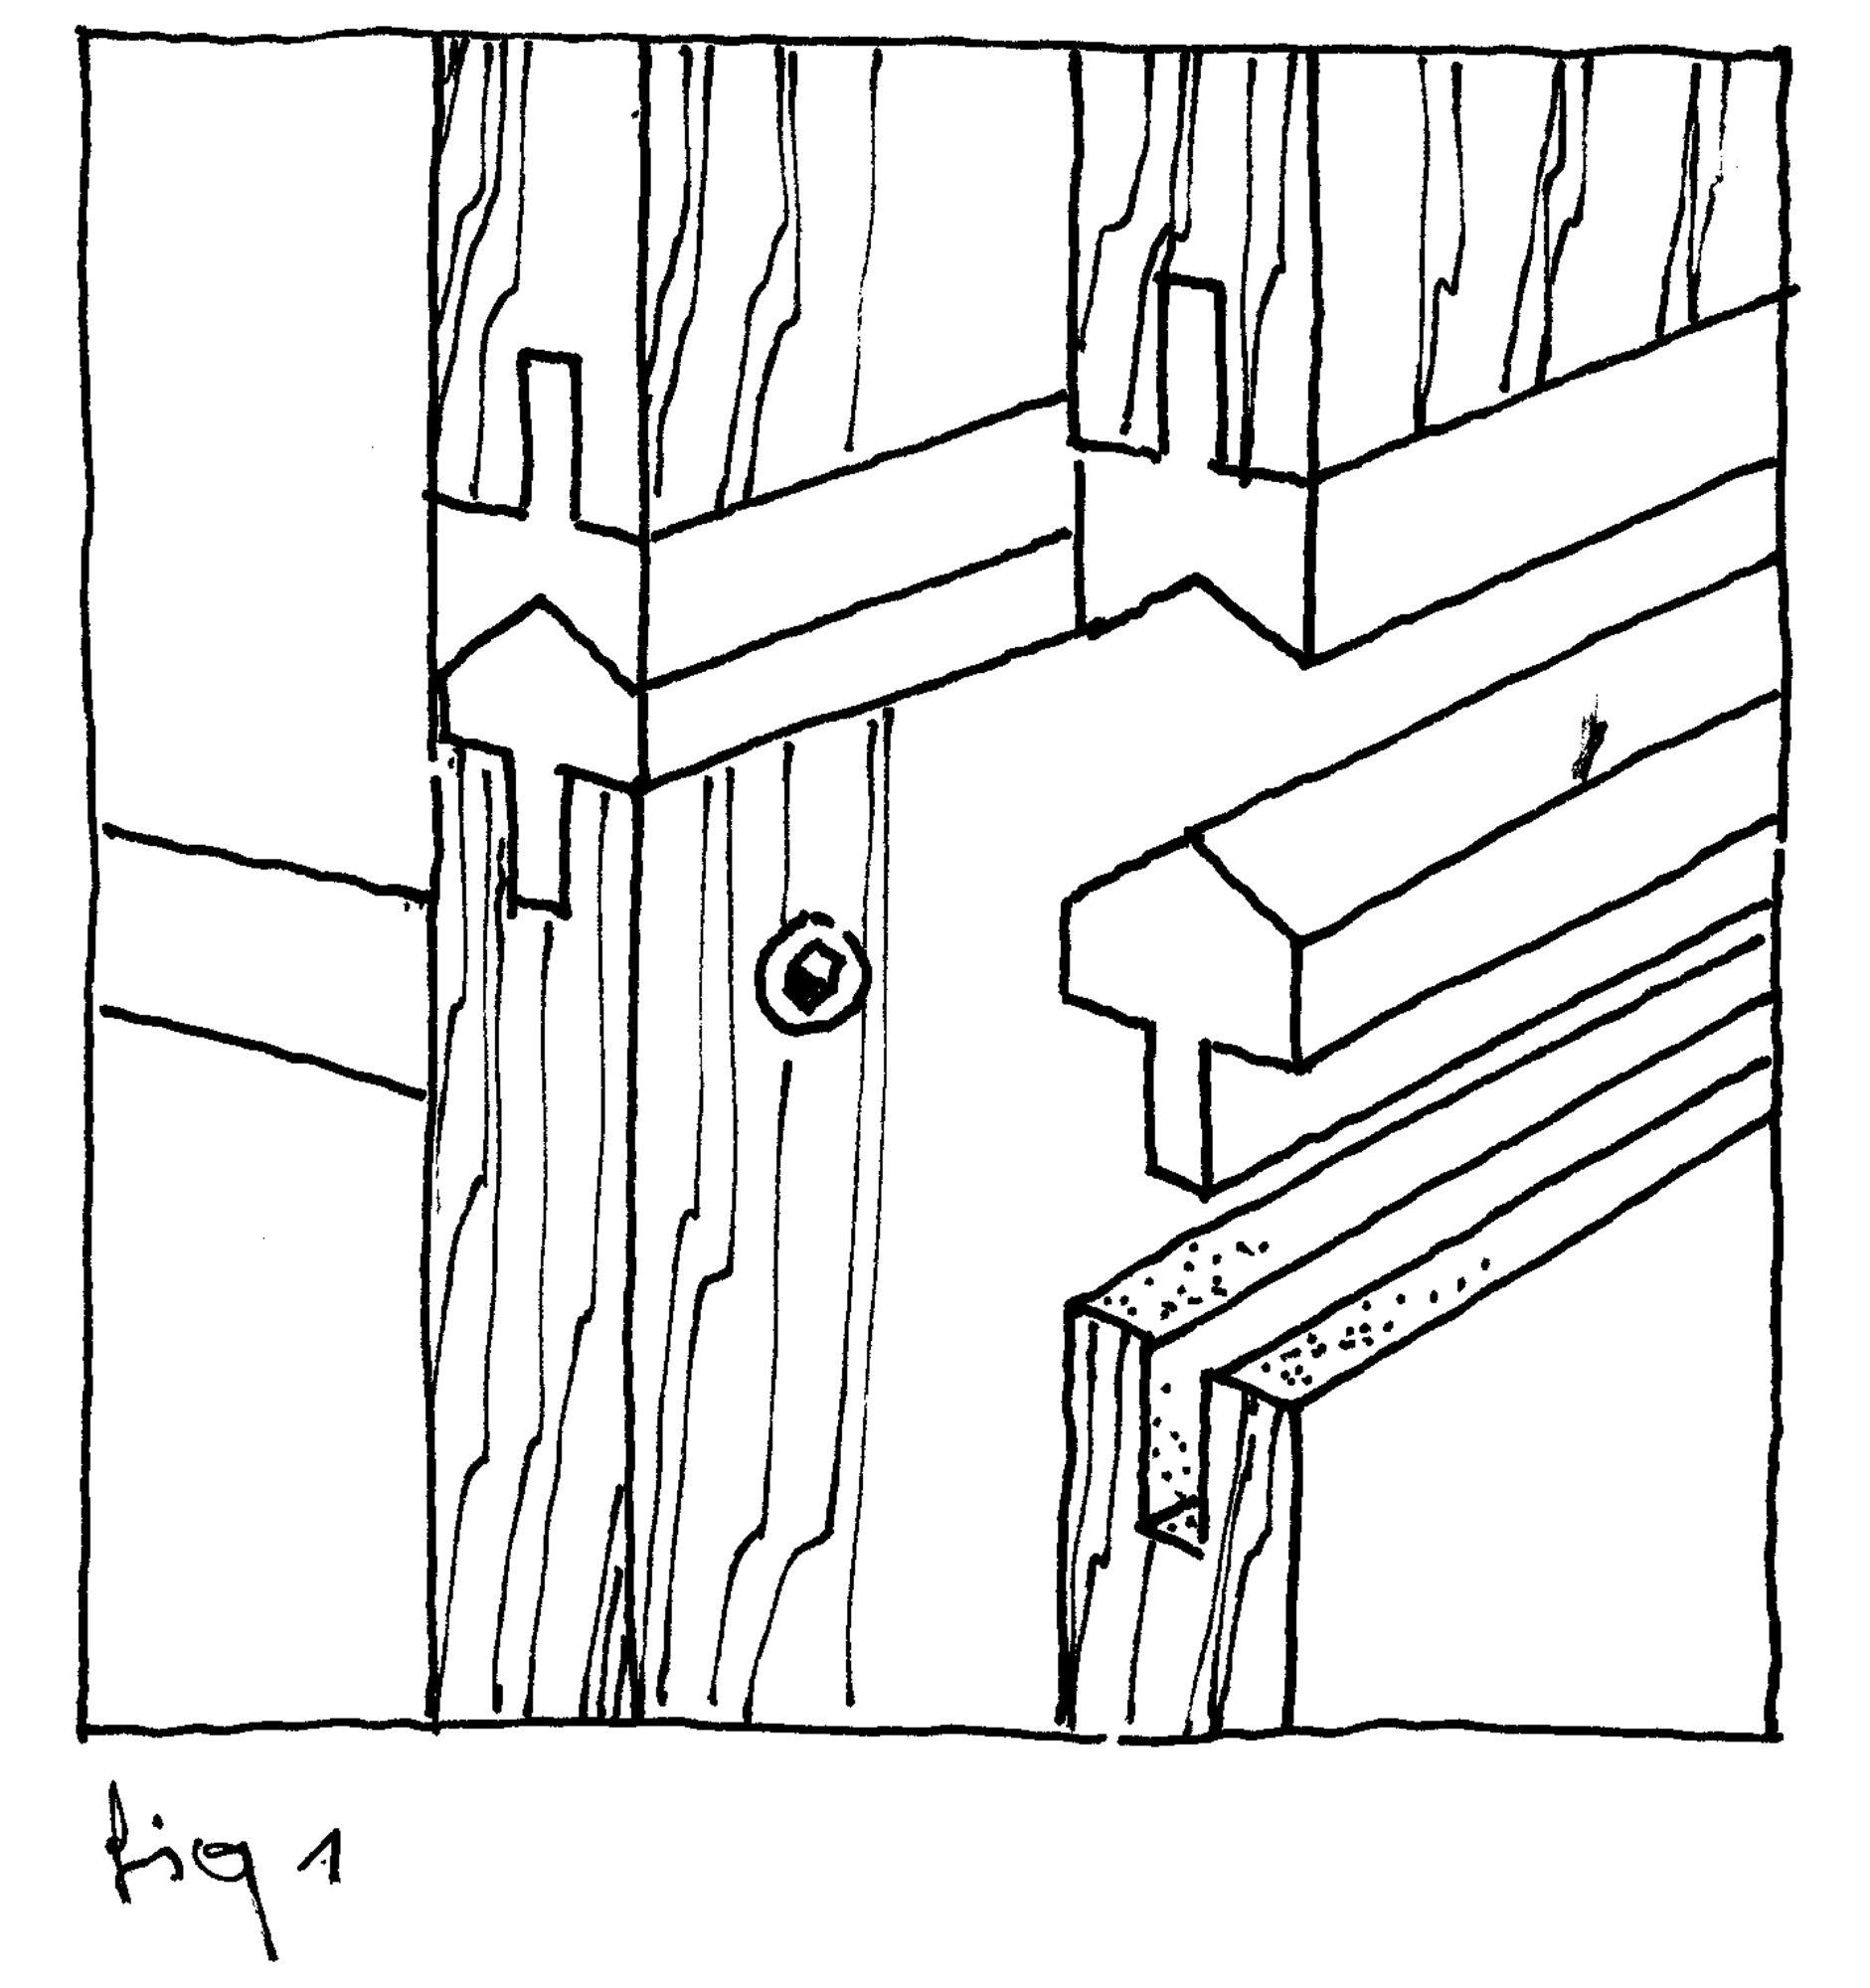 Decoplan meubelen De Coene 01